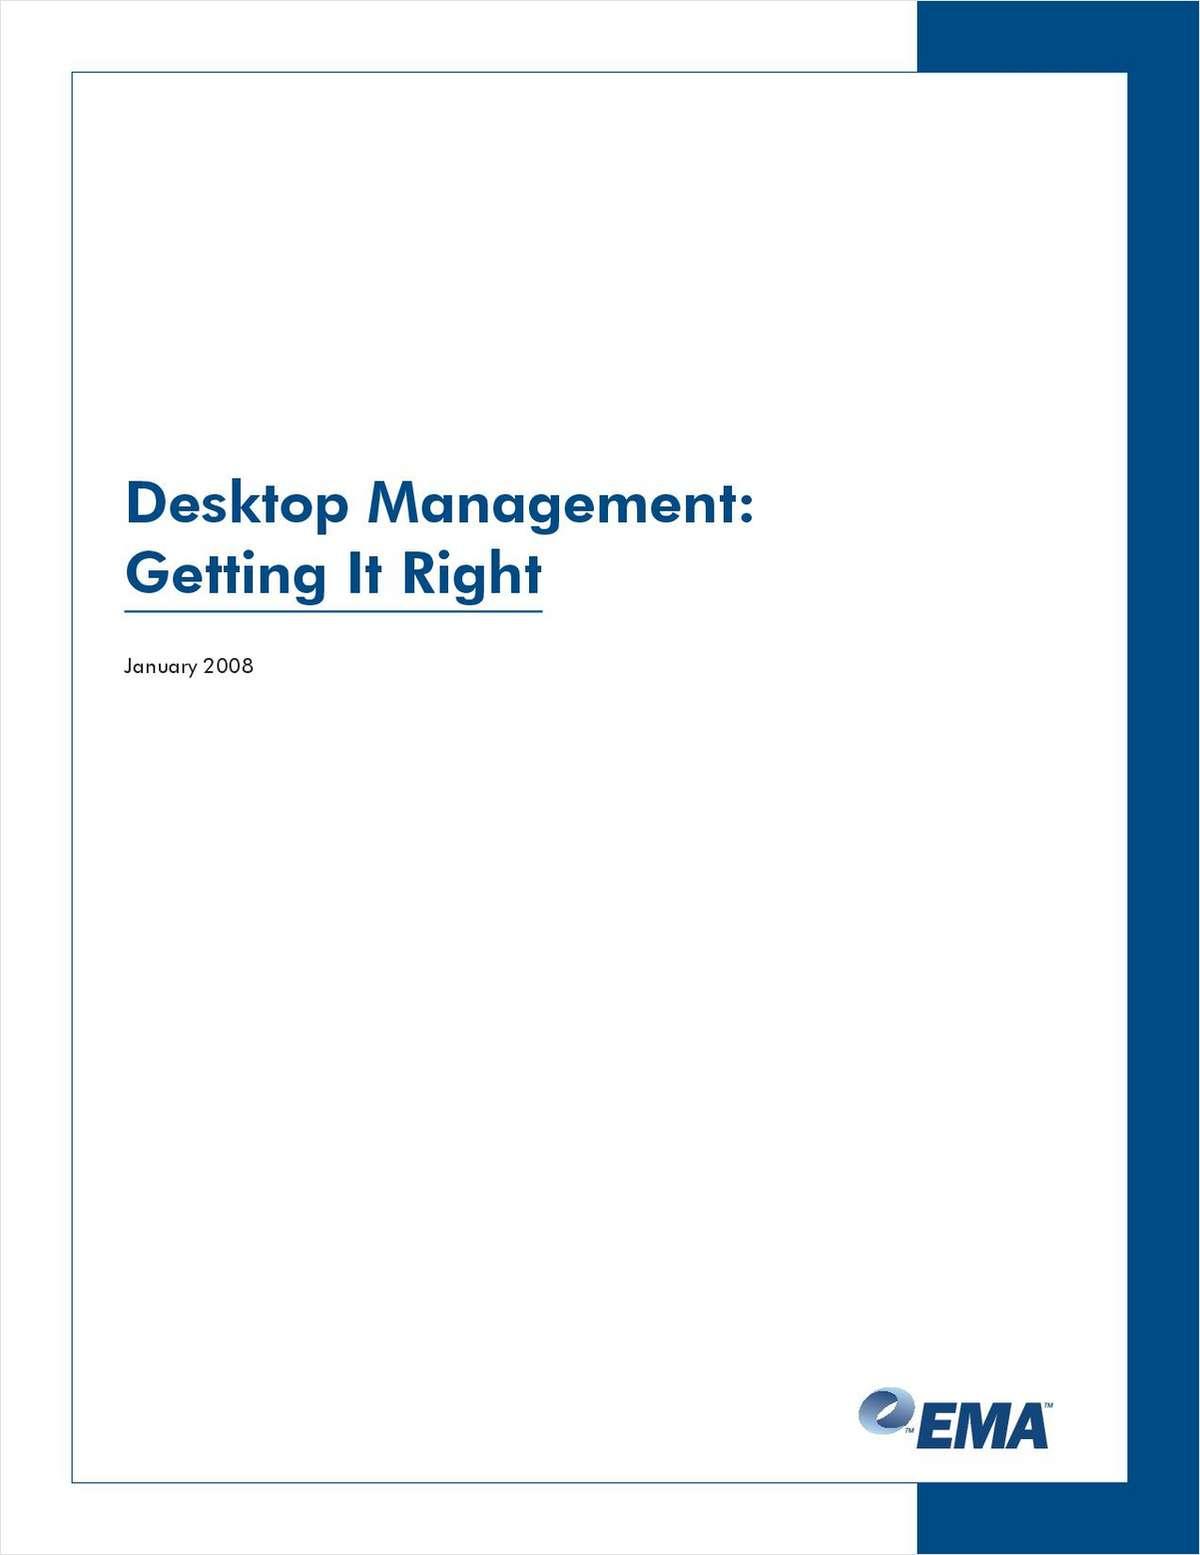 Desktop Management: Getting It Right